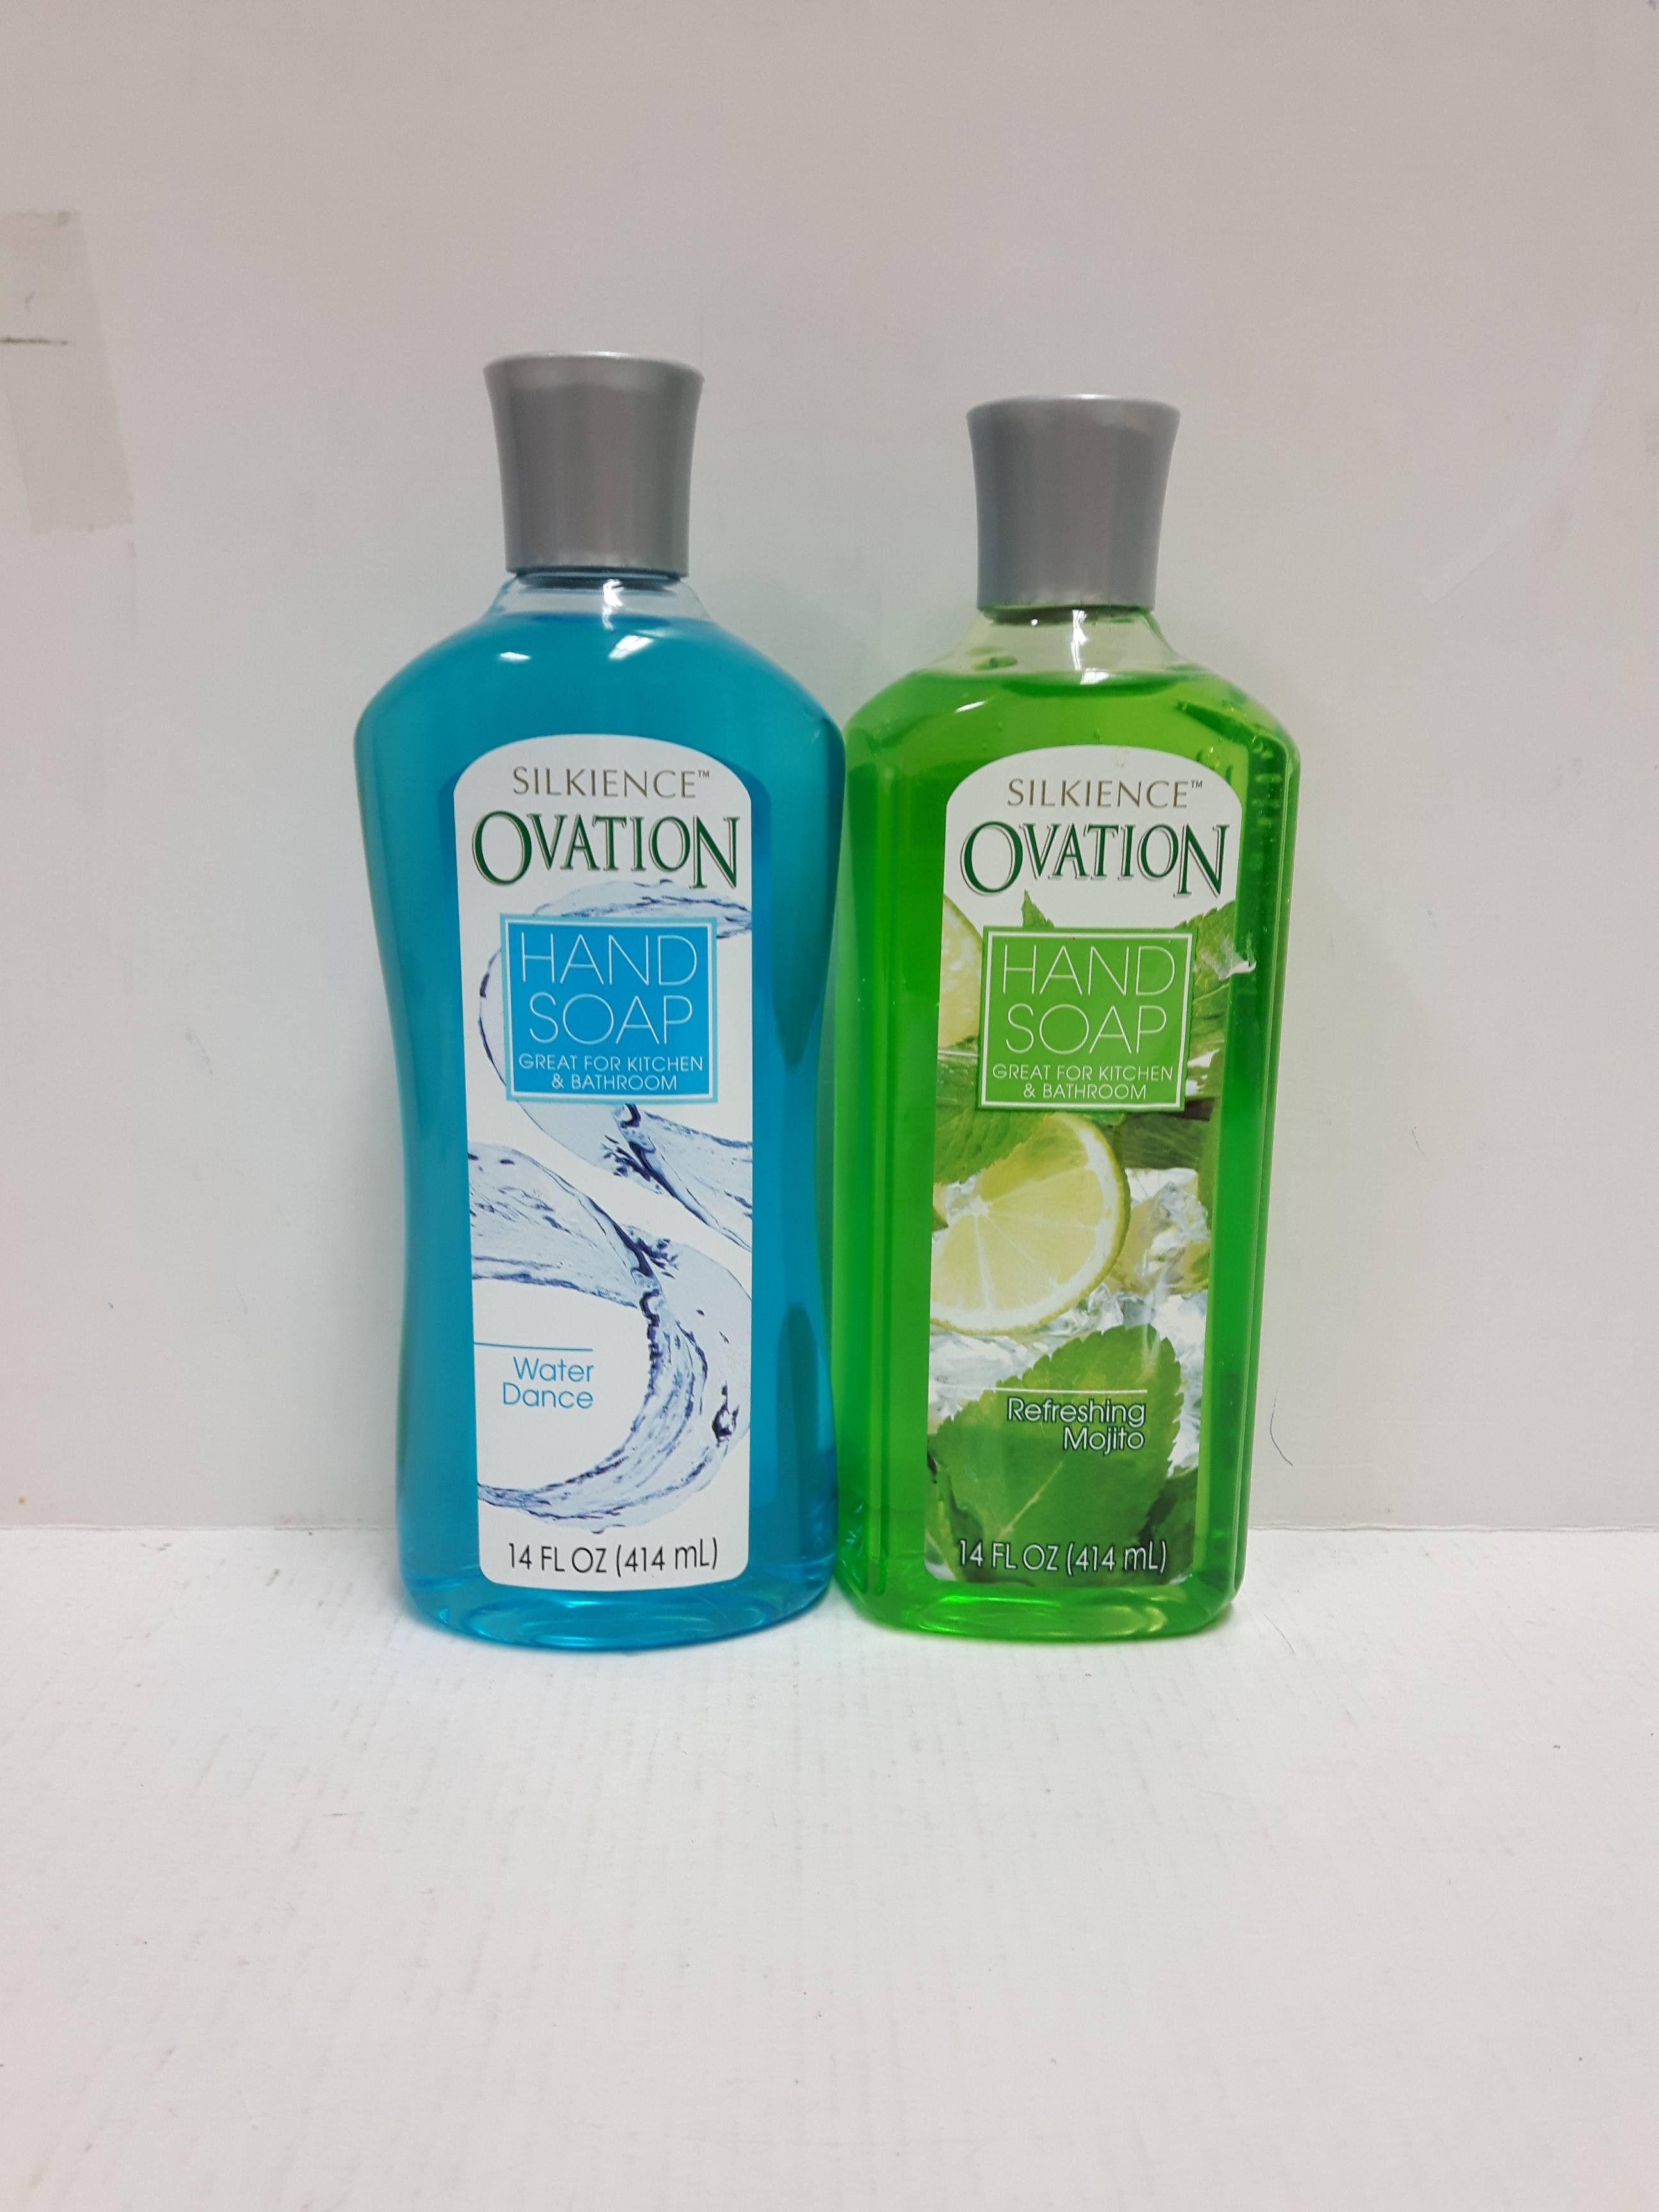 Ovation hand soap | Multi Brands Outlet